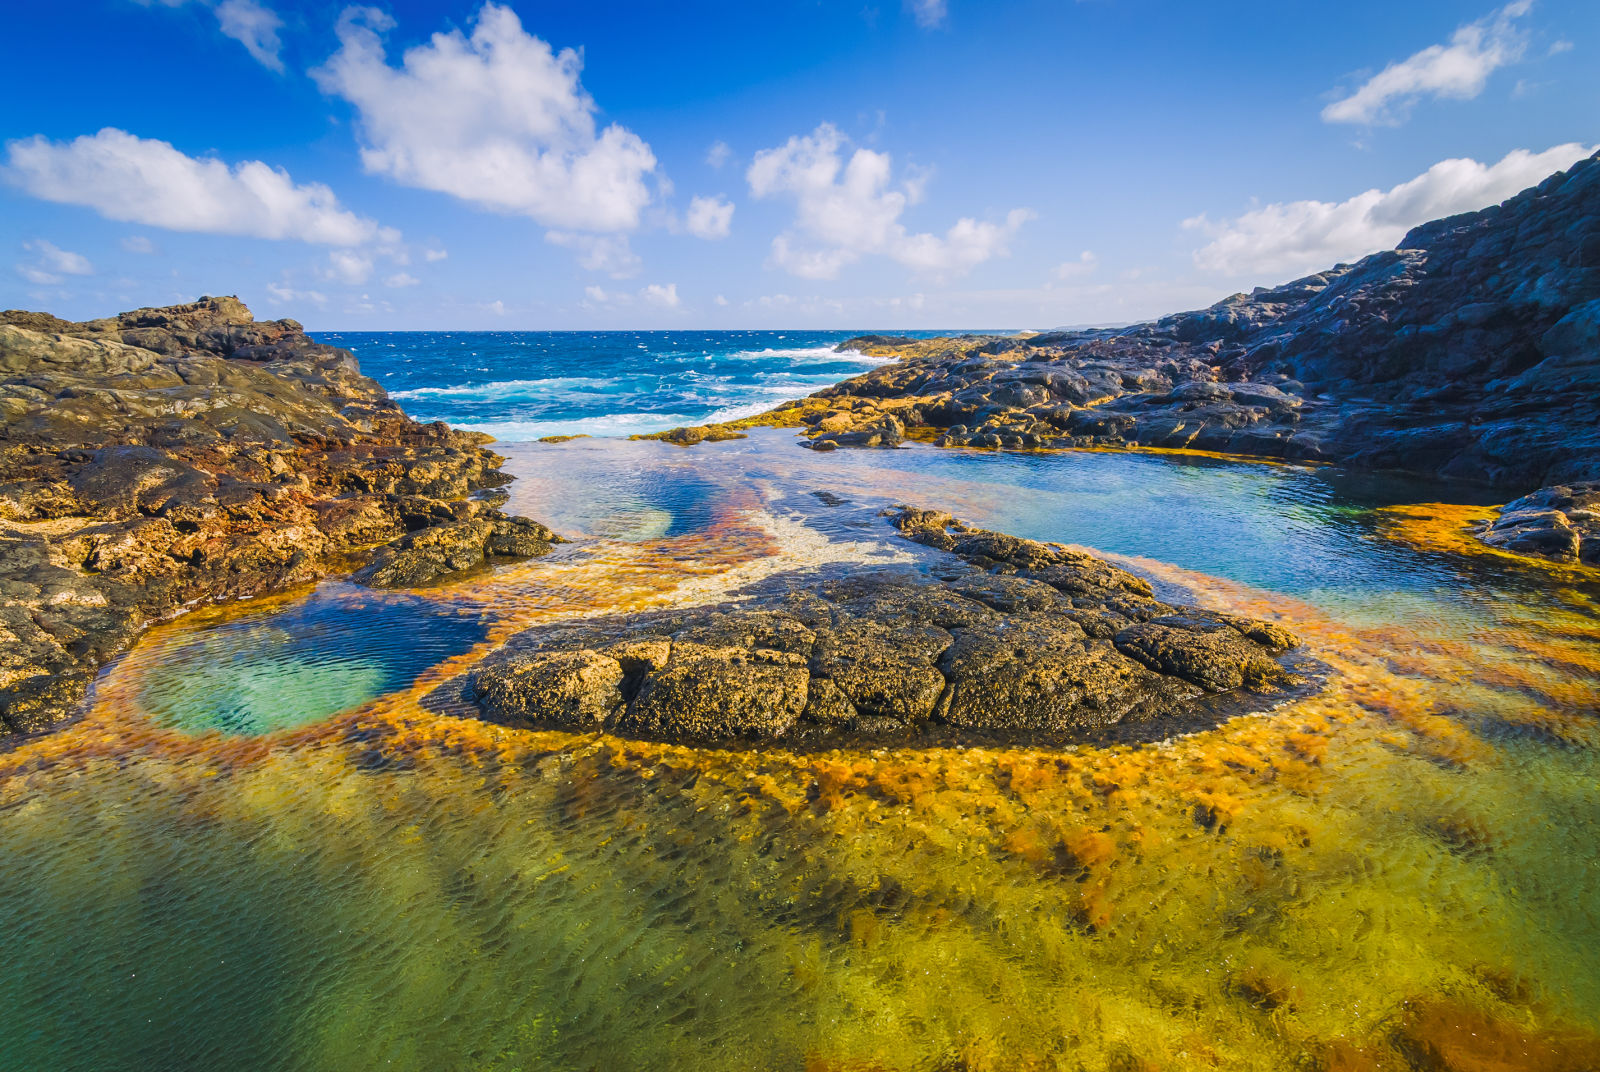 Canary Islands, Cloud, Landscape